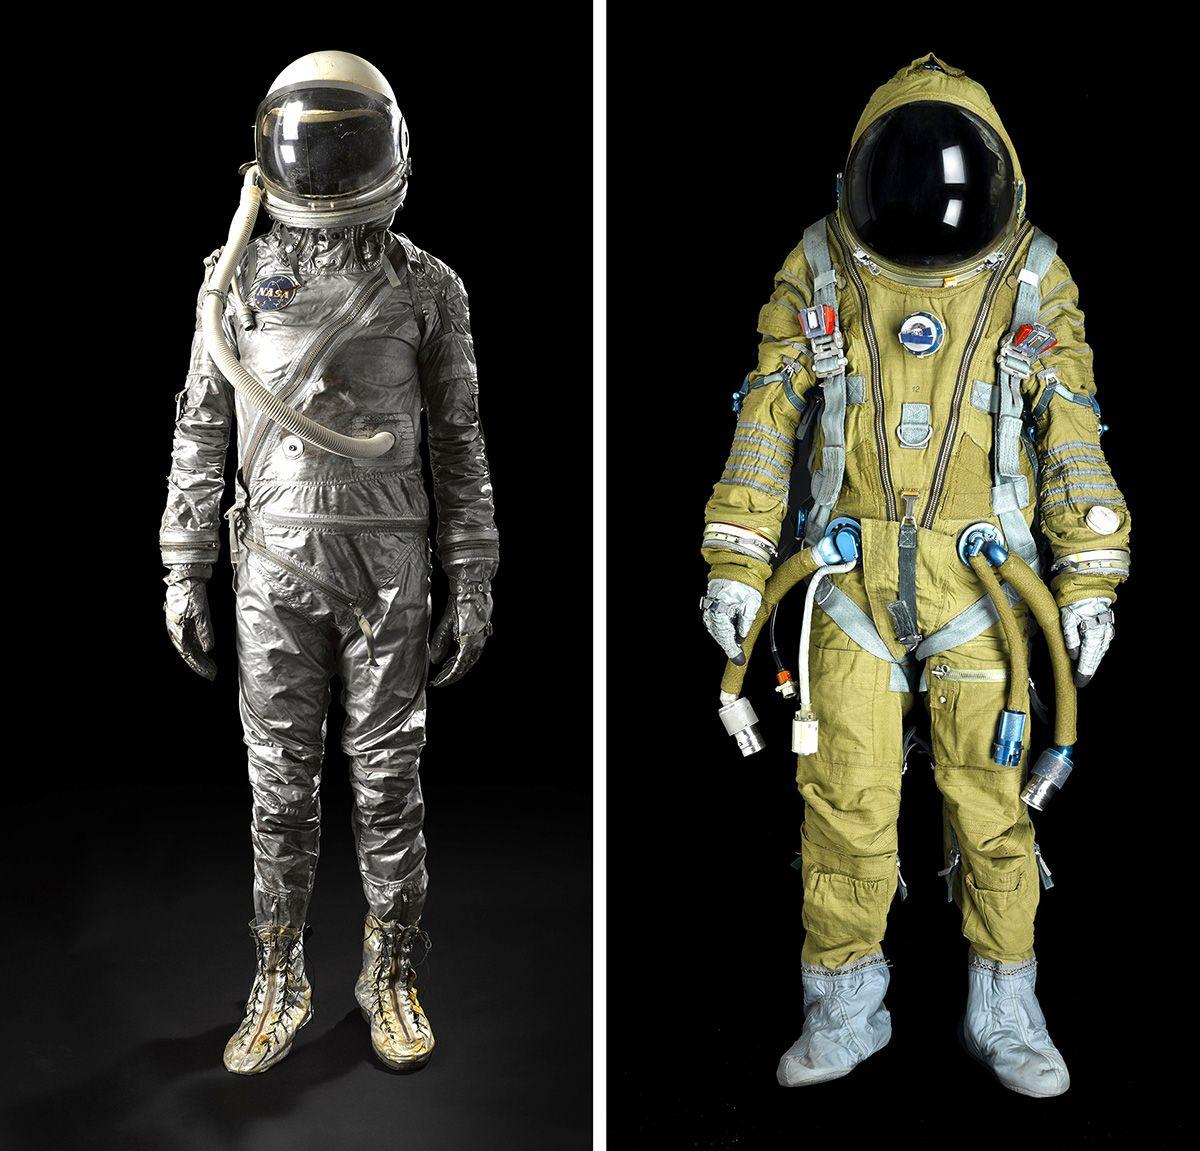 US glam or Soviet grunge Vintage spacesuits on sale